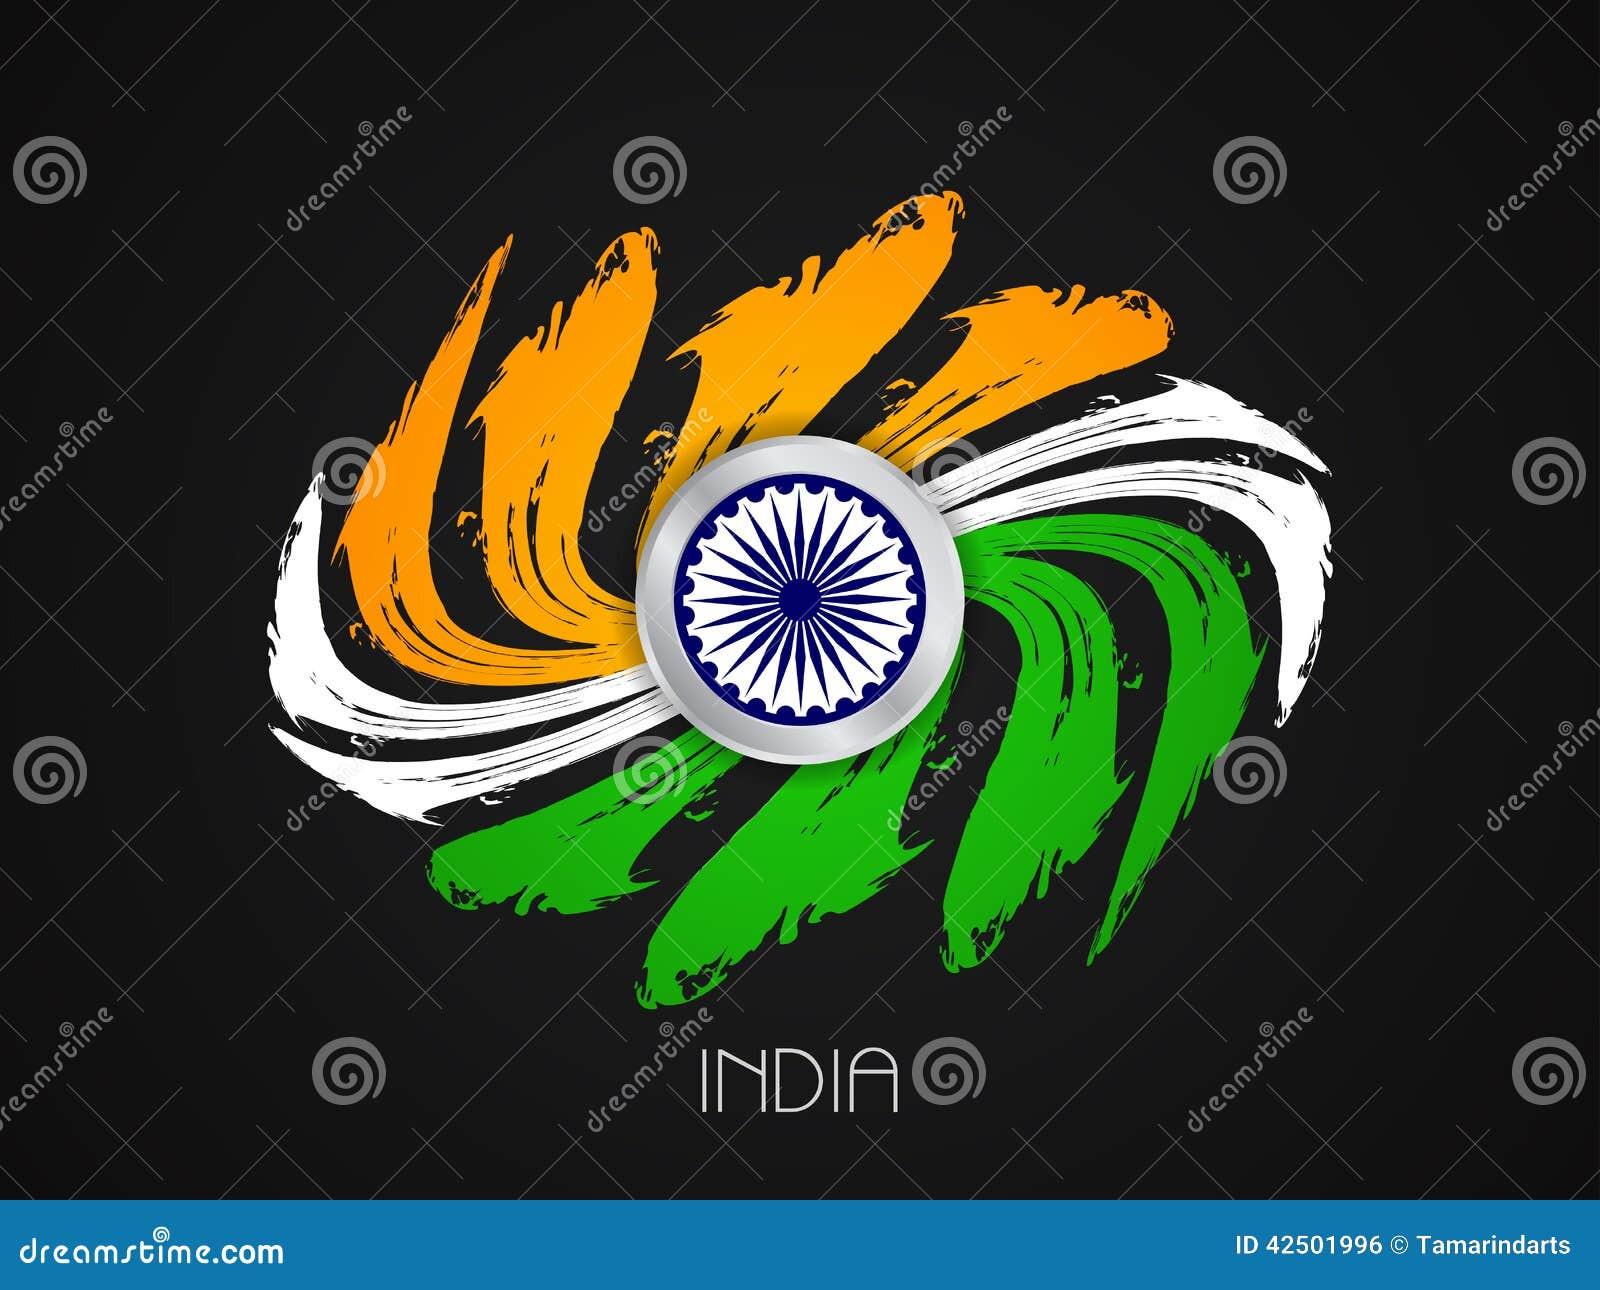 Indian Flag Theme: Indian Flag Theme Design Stock Vector. Illustration Of